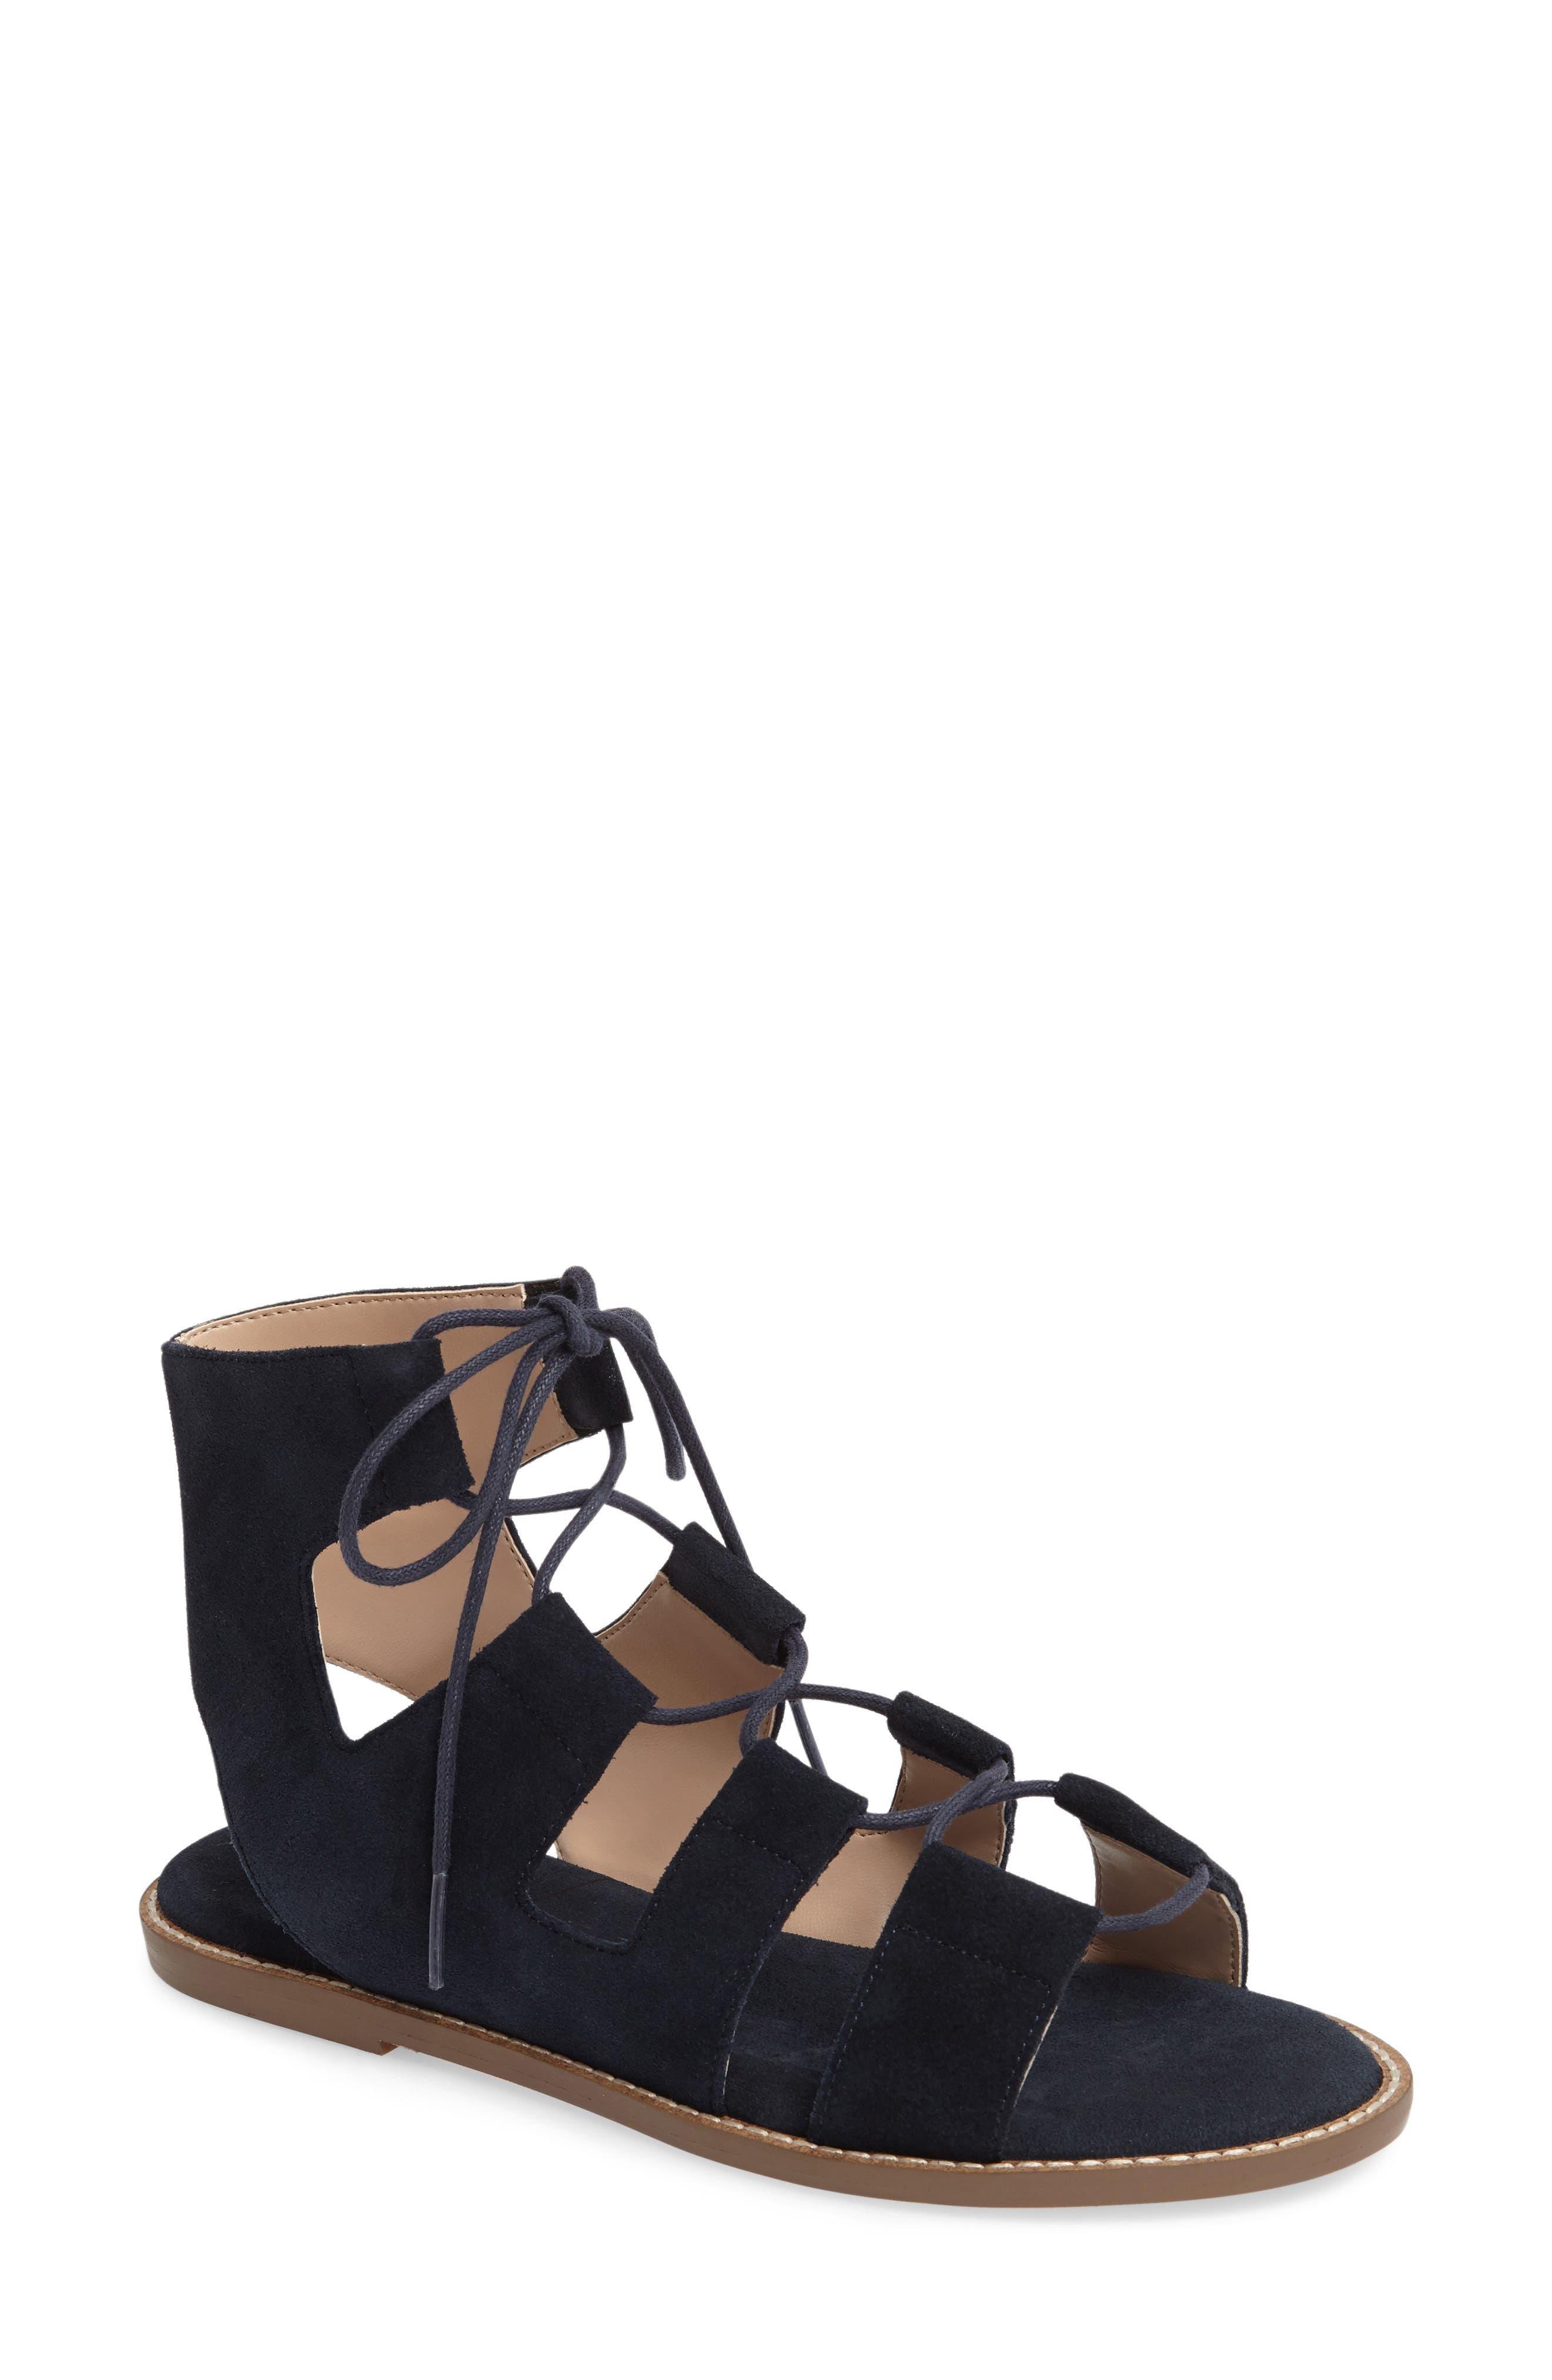 'Cady' Lace-Up Flat Sandal,                             Main thumbnail 4, color,